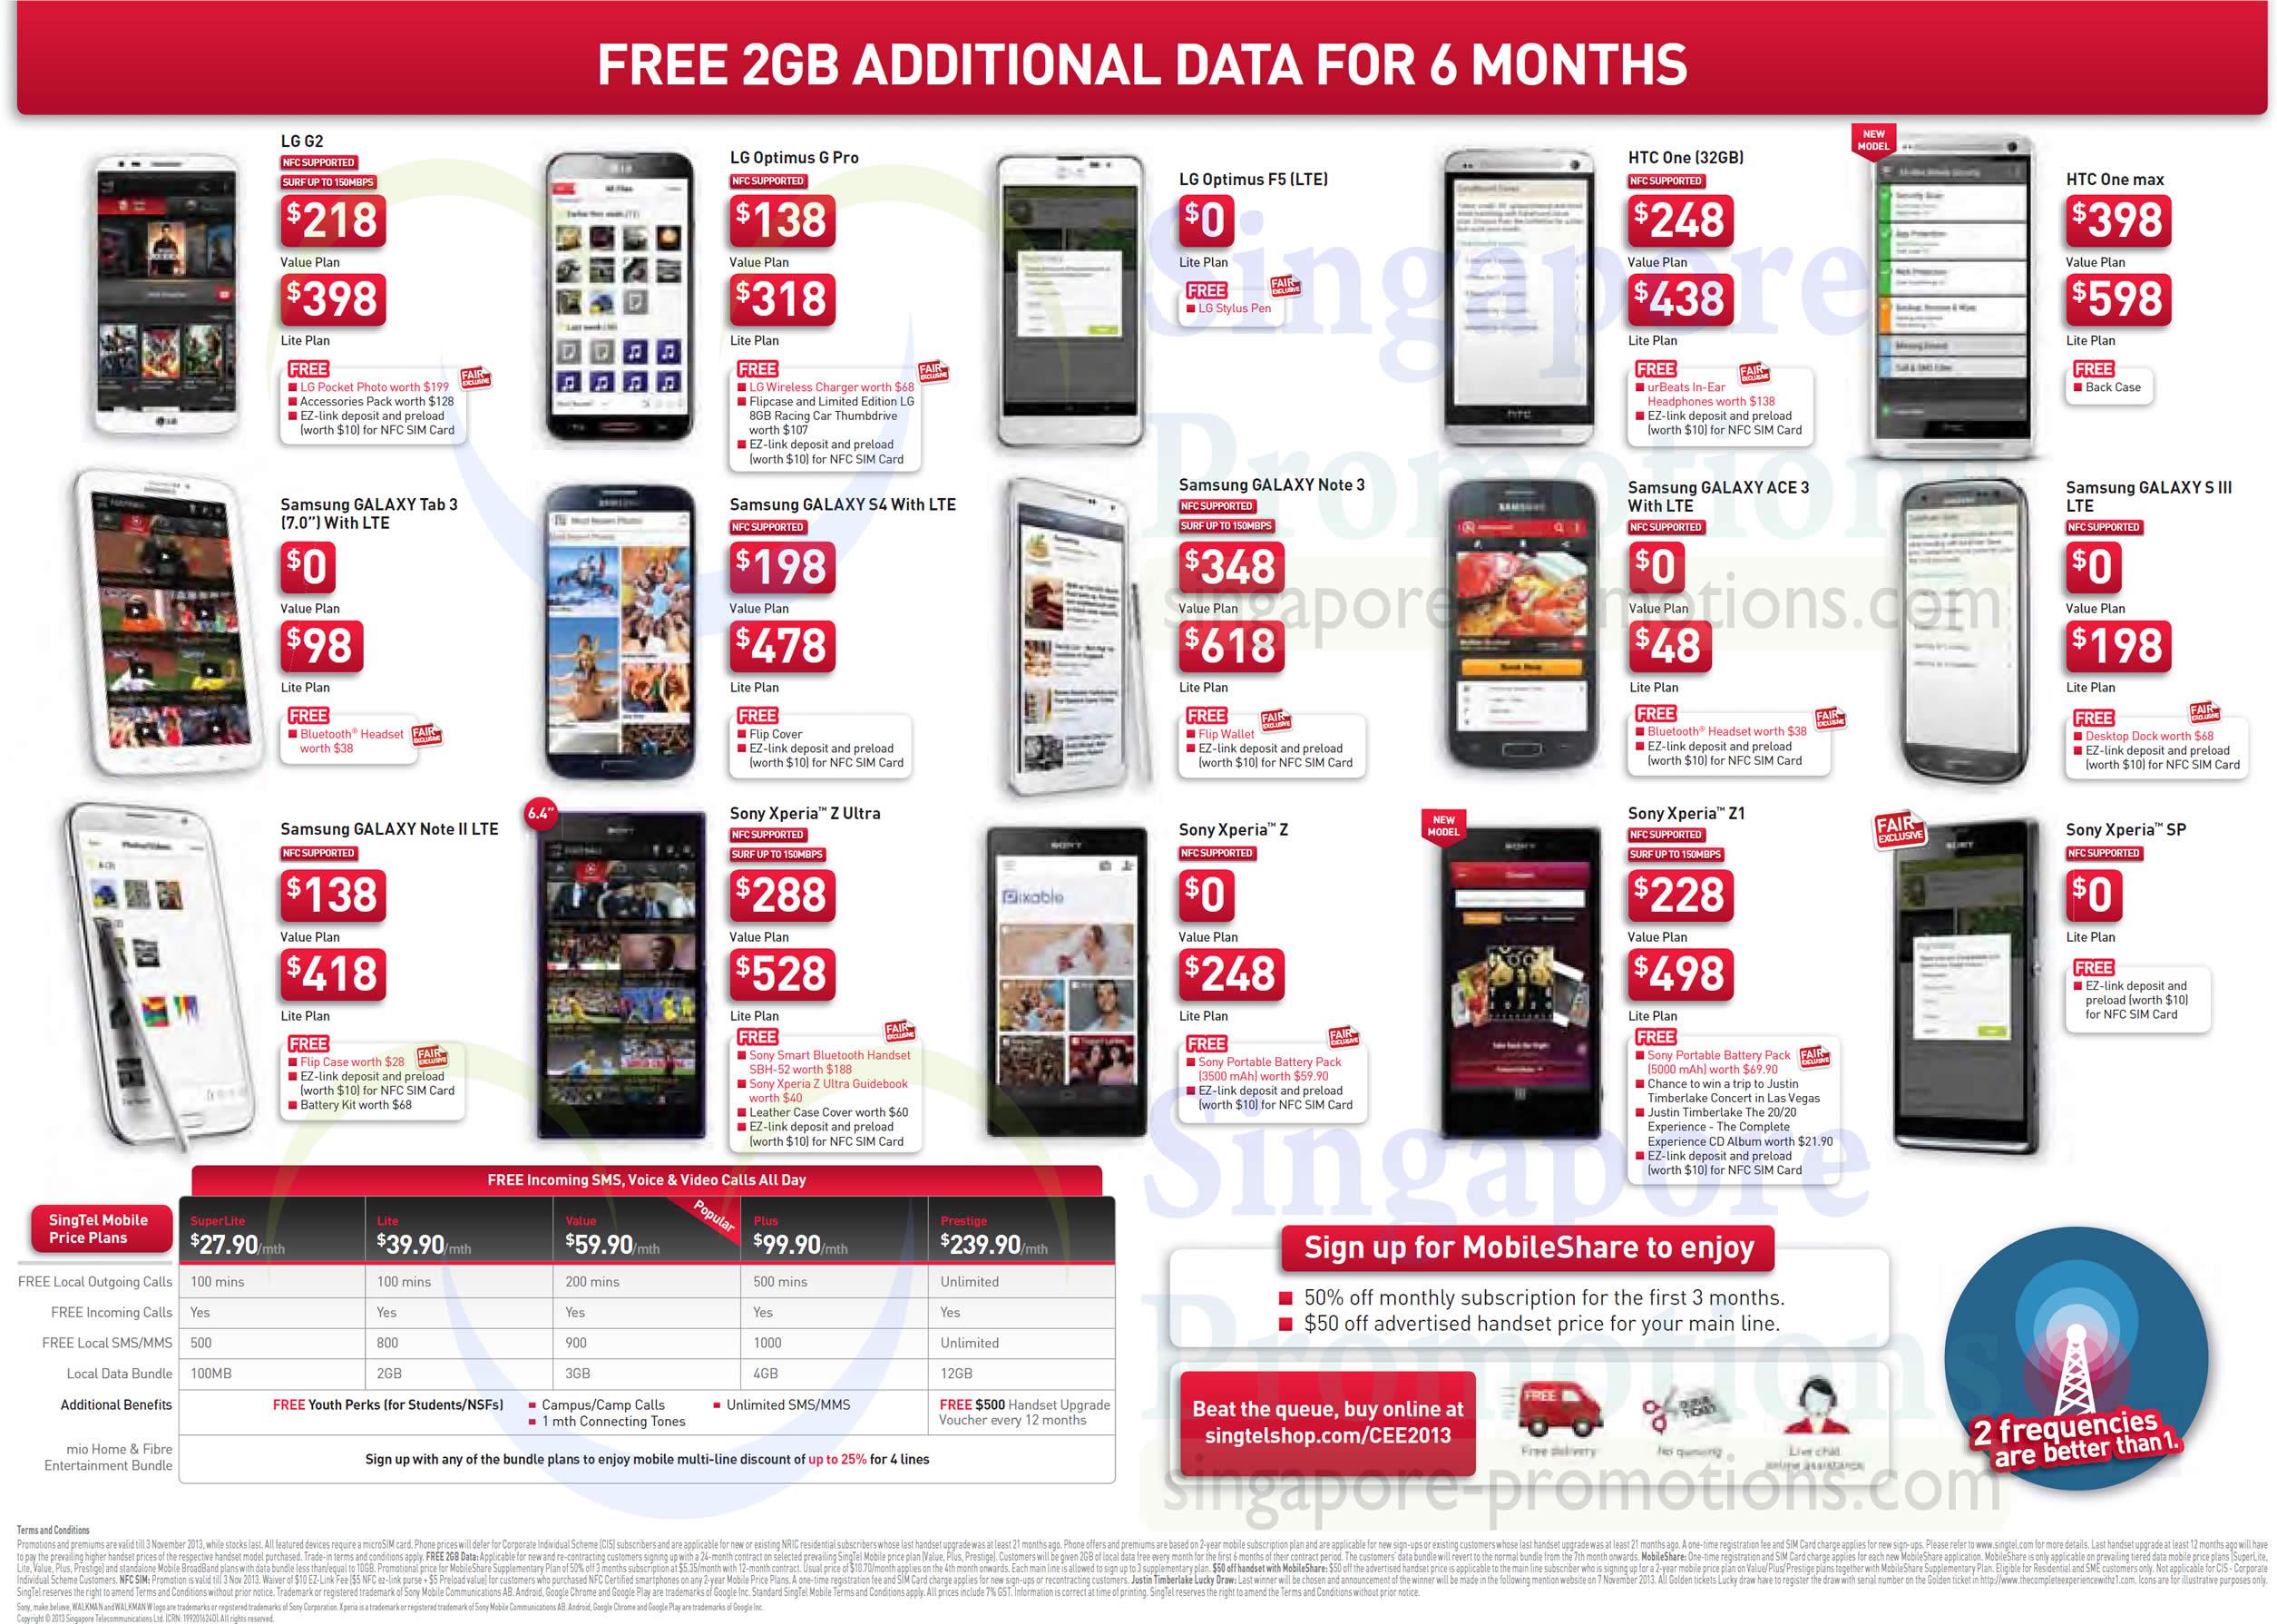 Sony xperia z1 deals on three